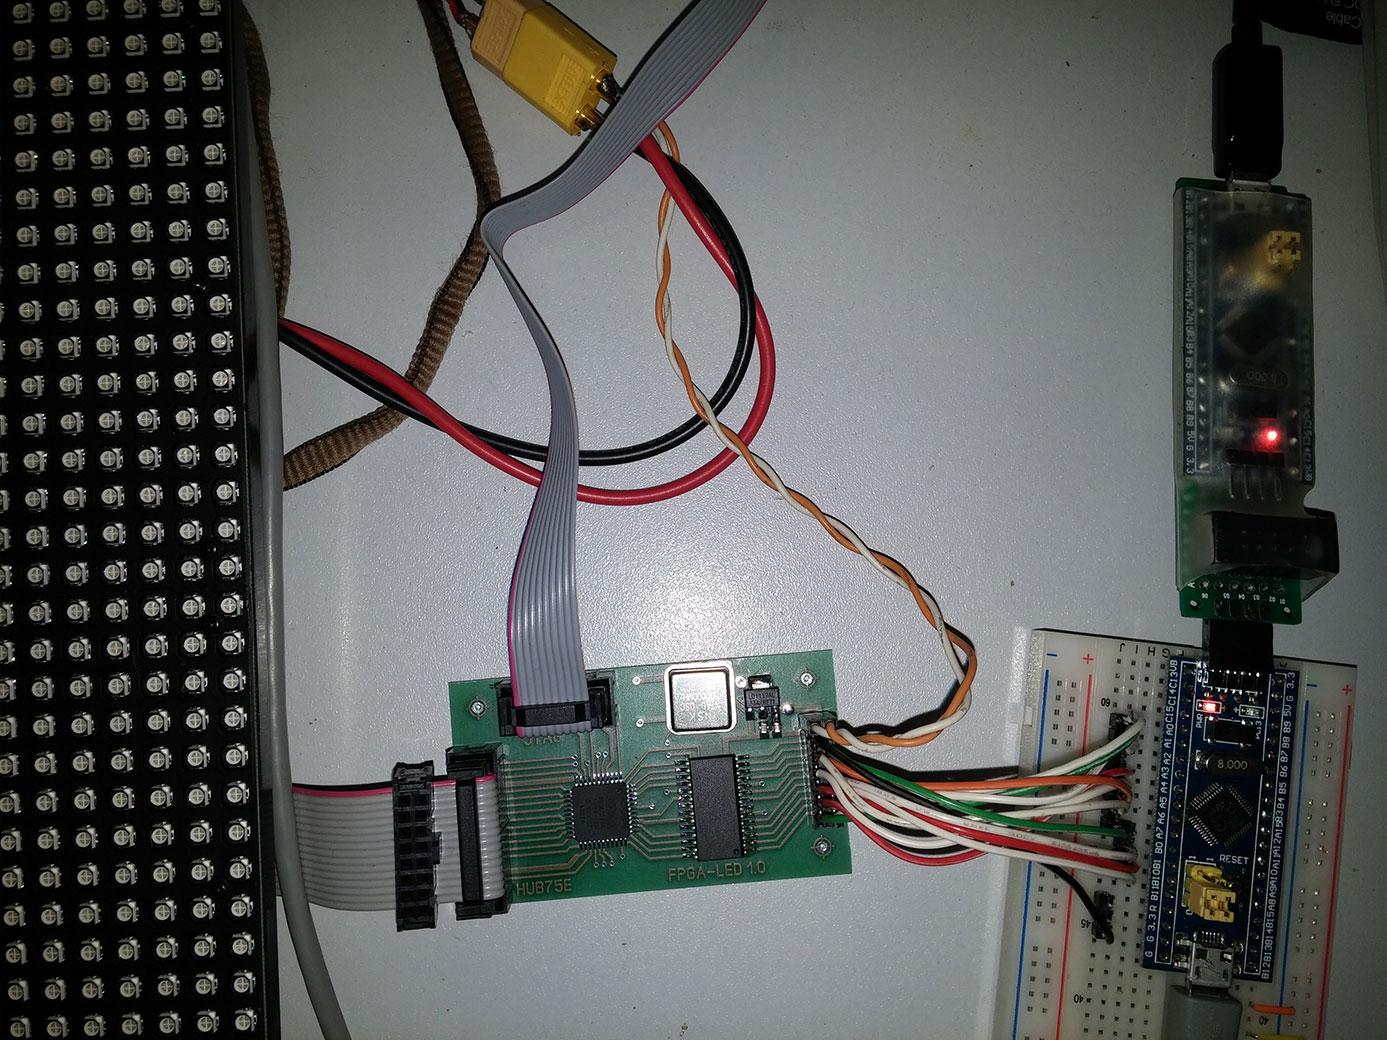 DIY-контроллер LED панели на CPLD с использованием BAM модуляции - 4